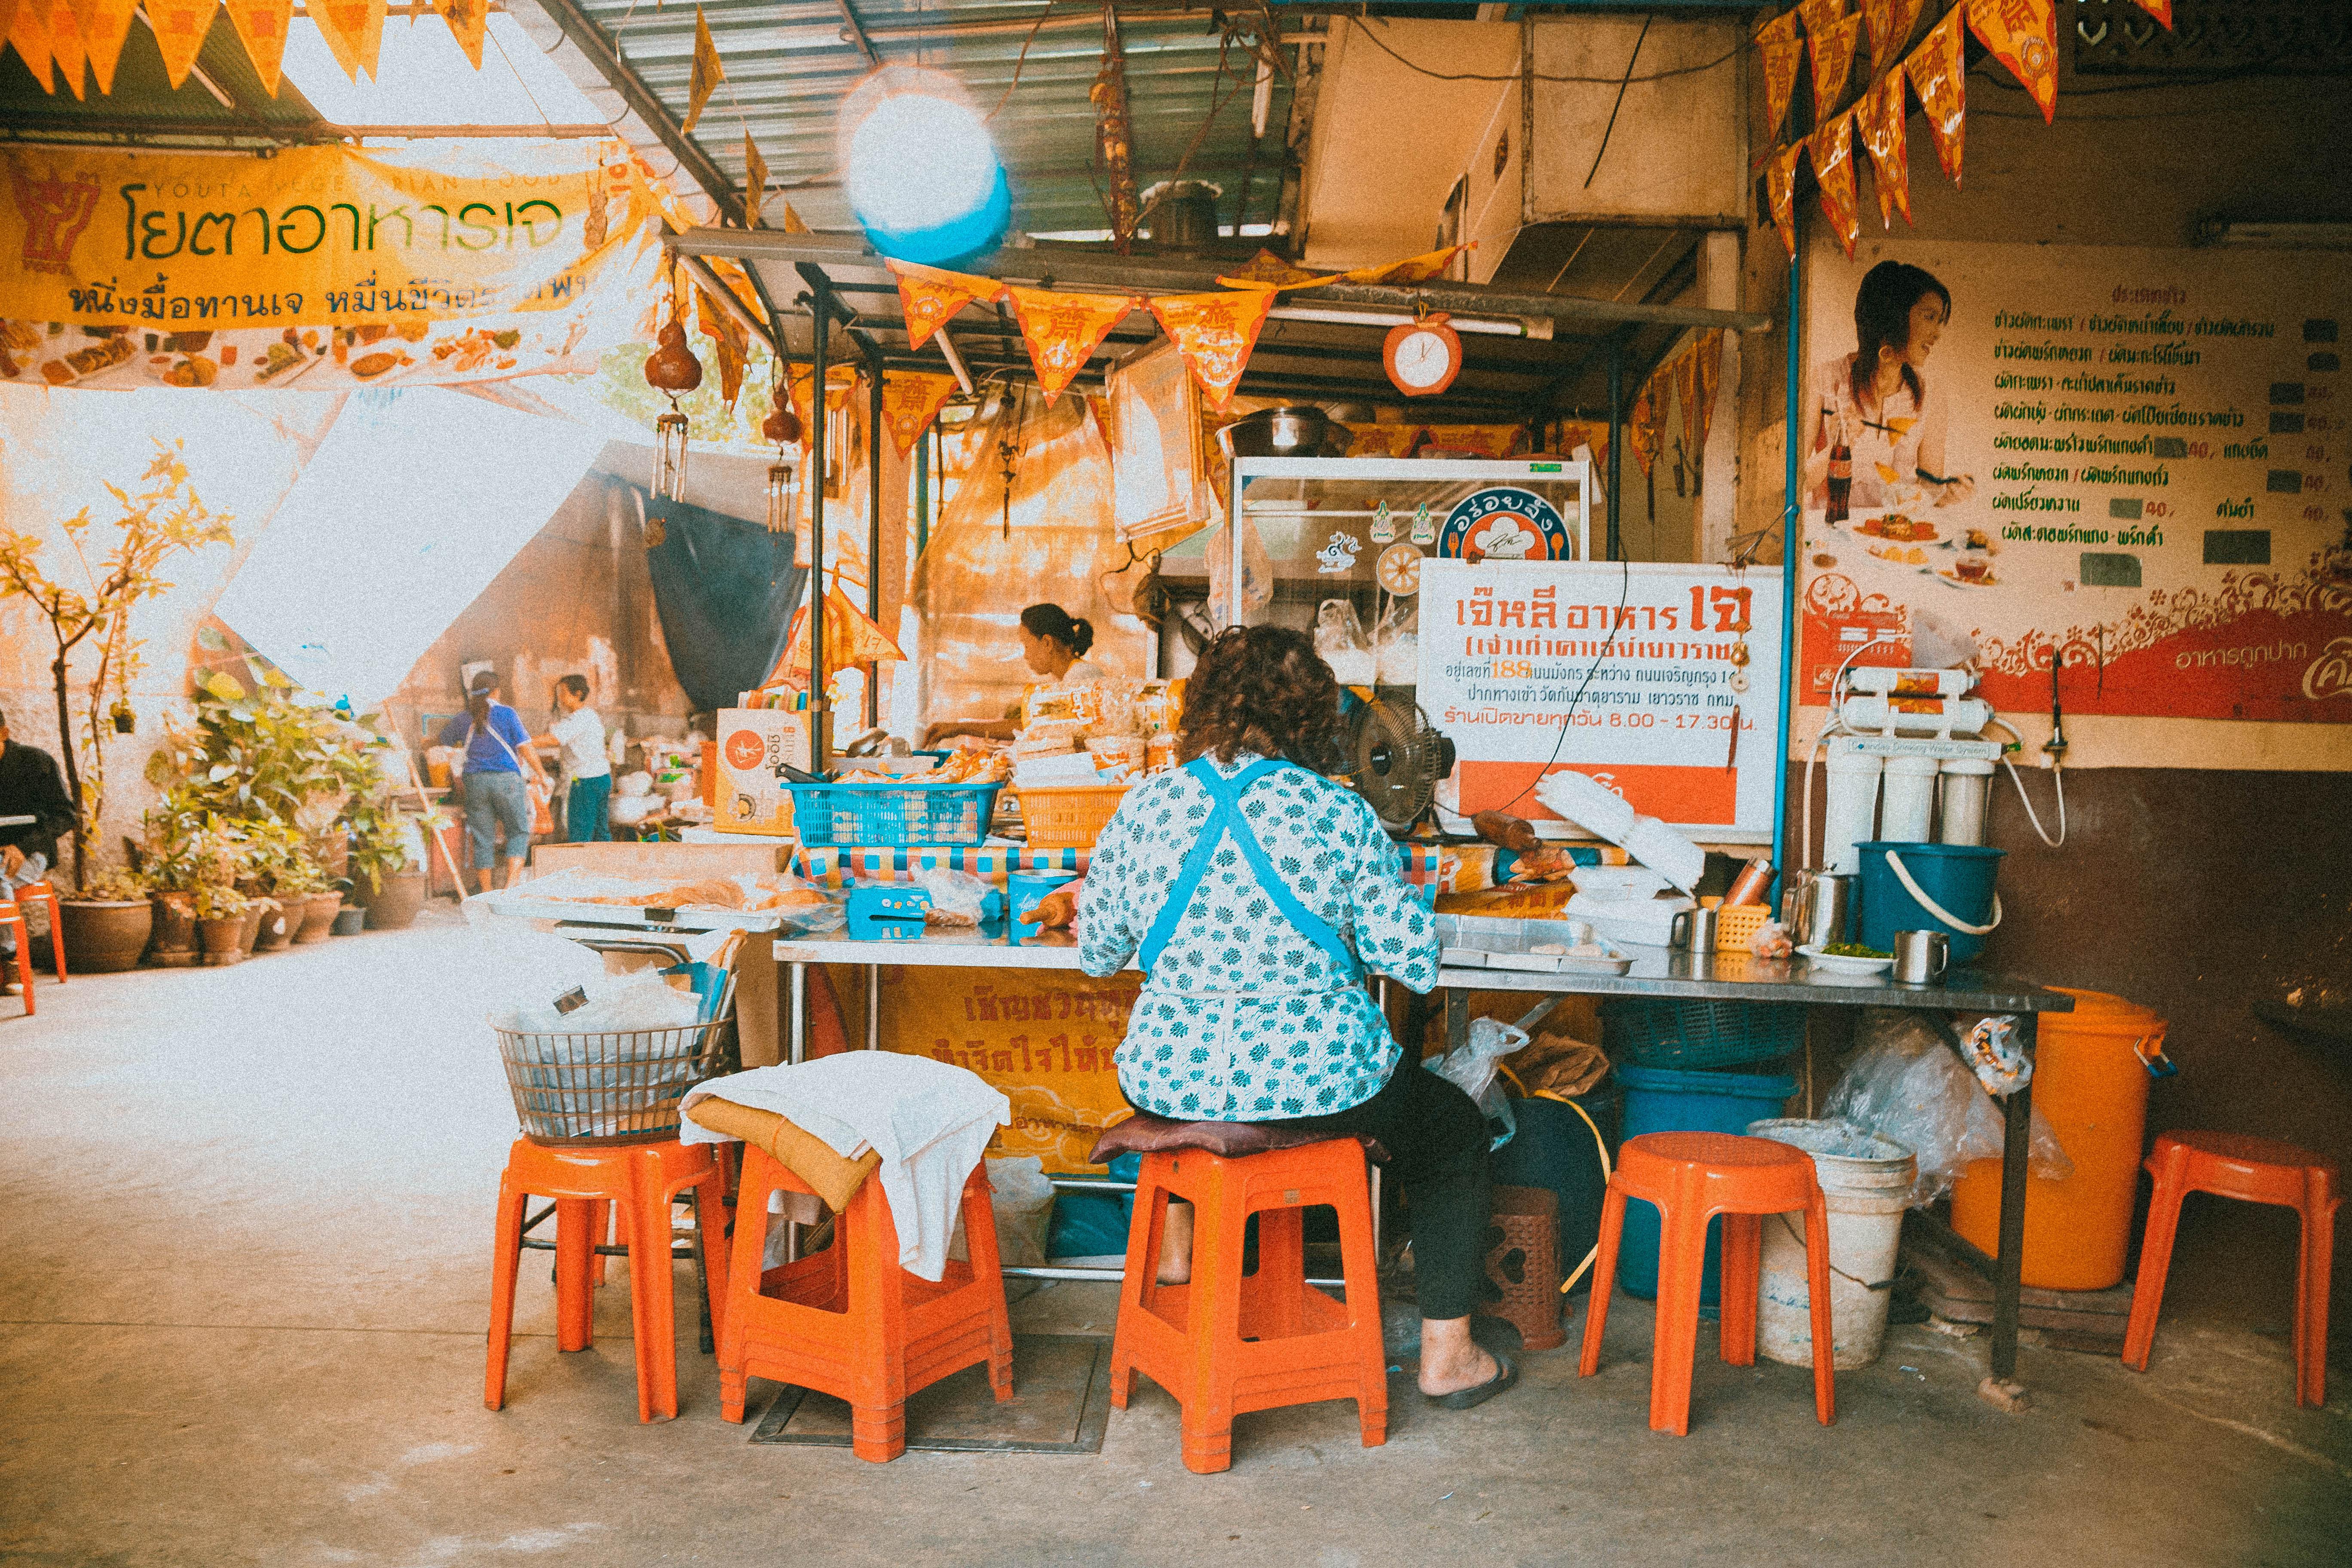 pastries vegan thailand bangkok ladie local ood local cuisine eating like local culture